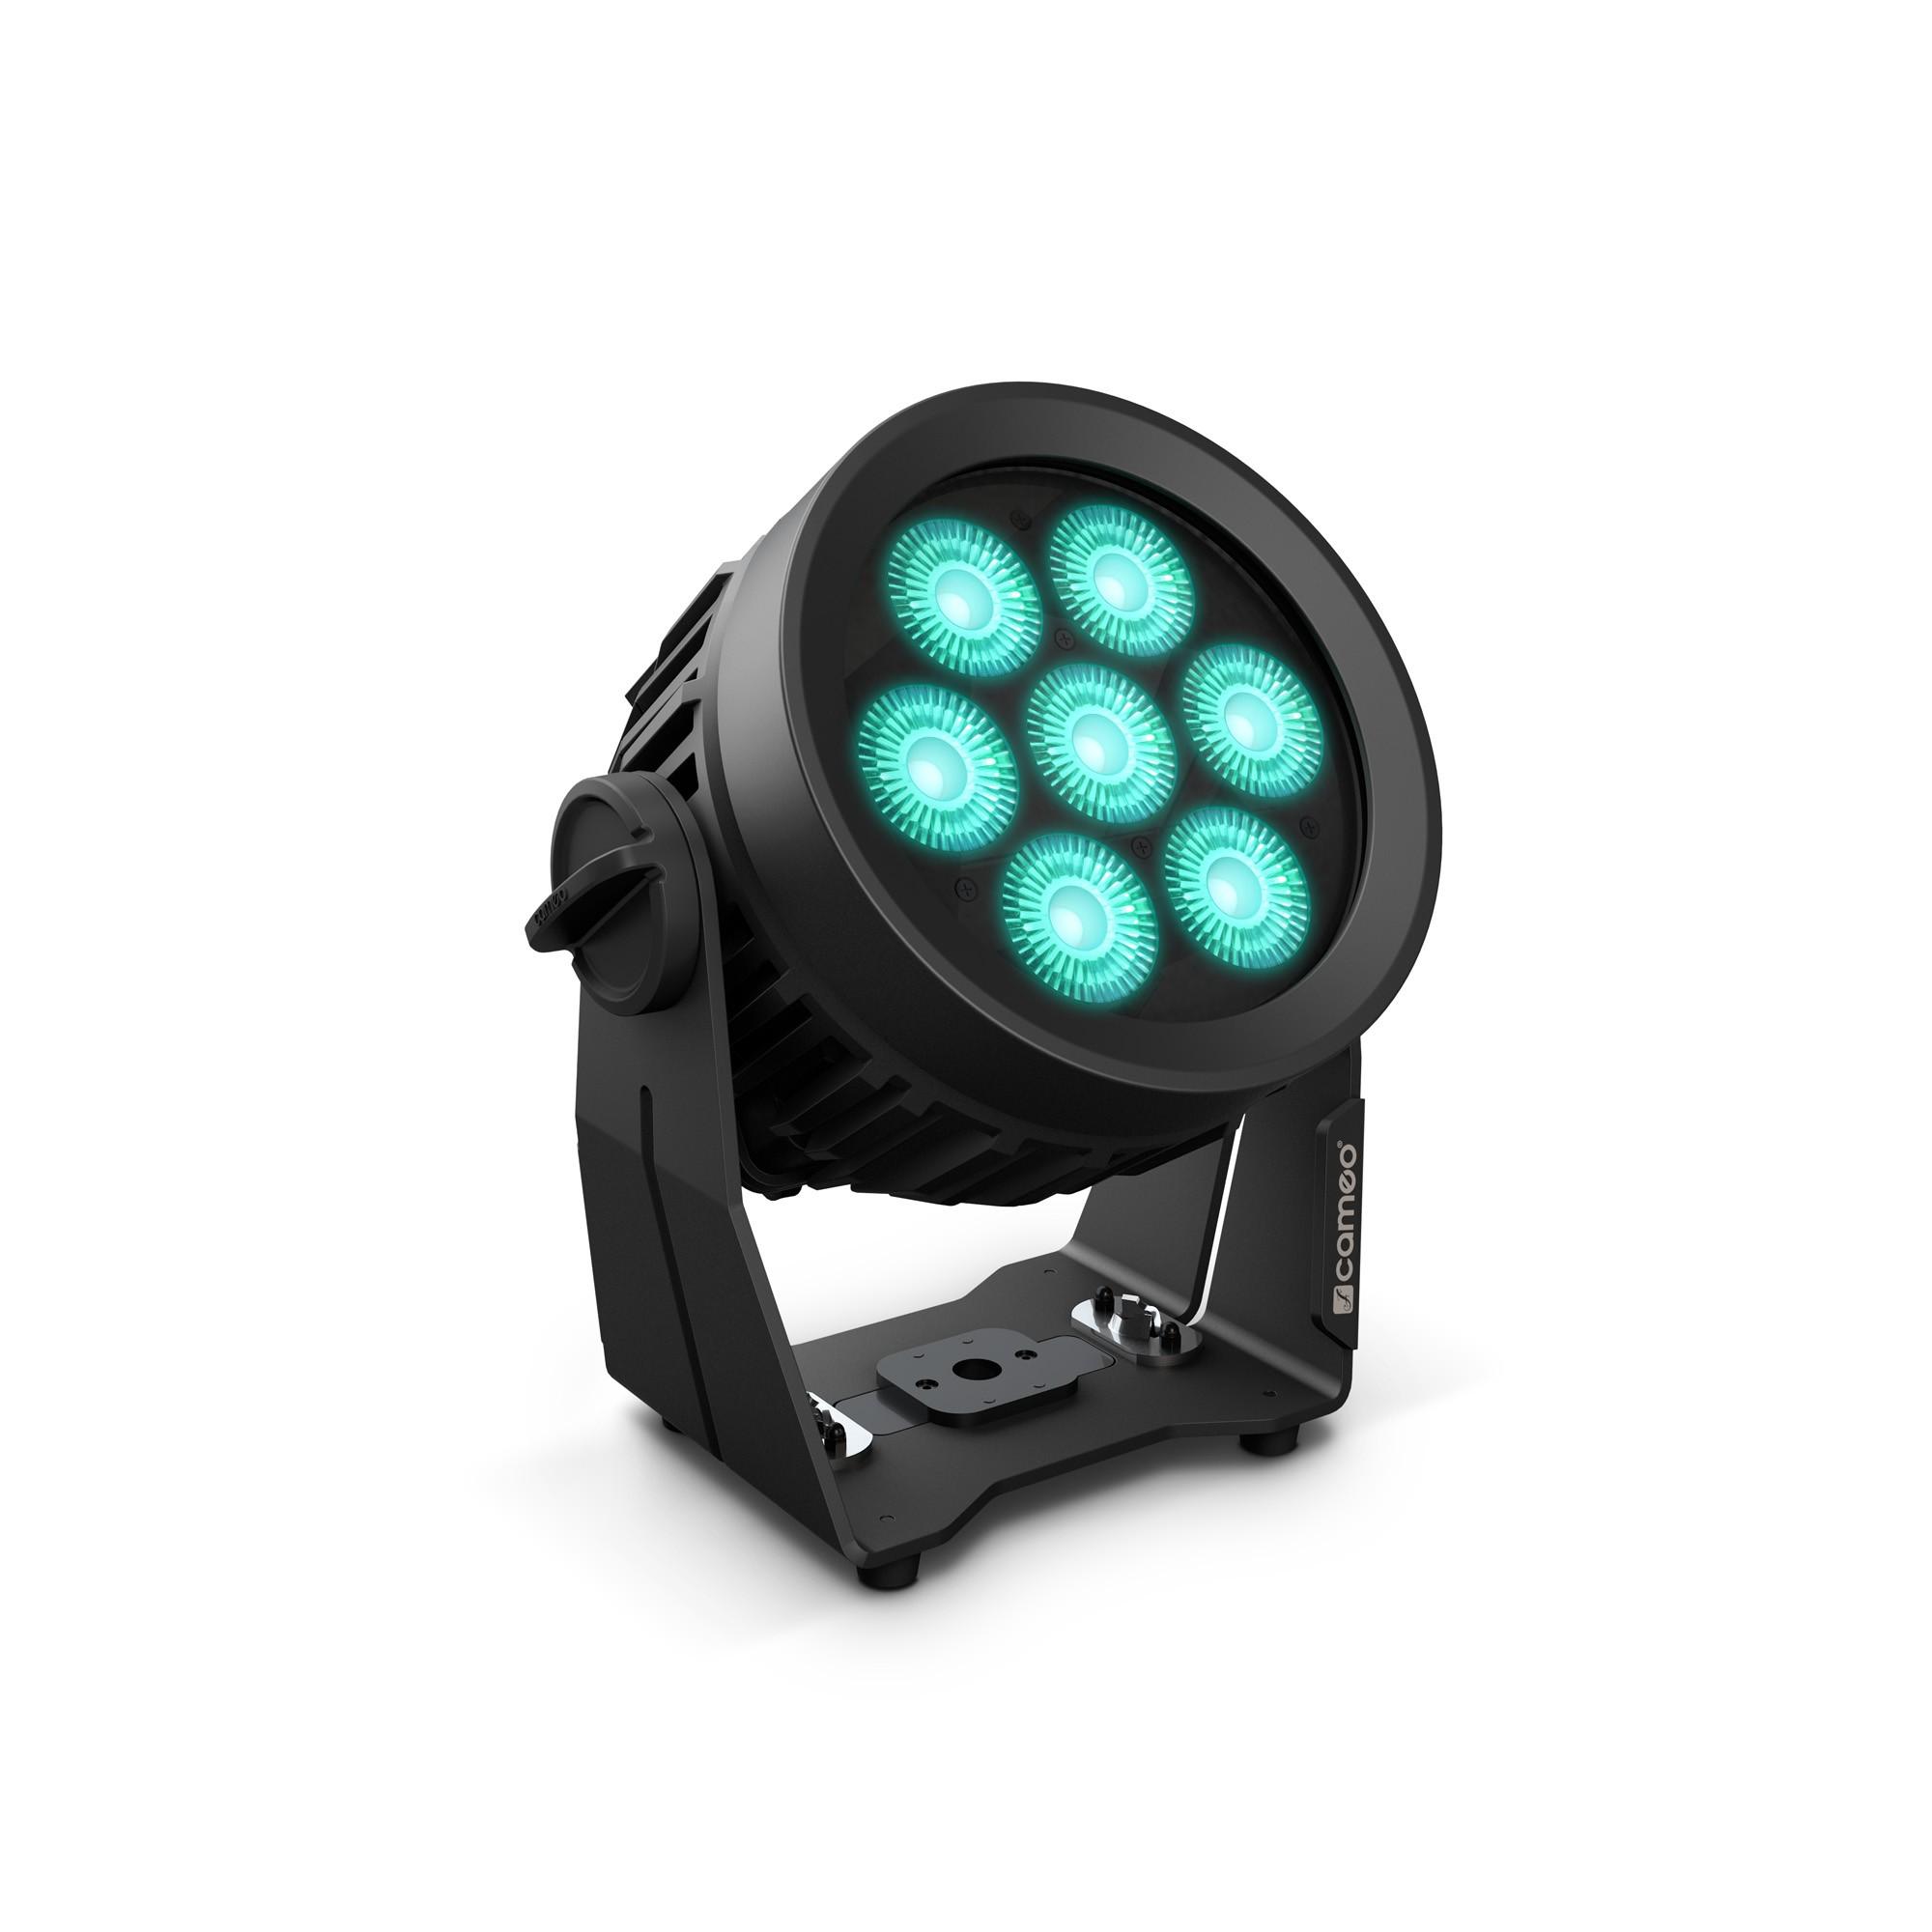 cameo flat pro 7 g2 outdoor lights